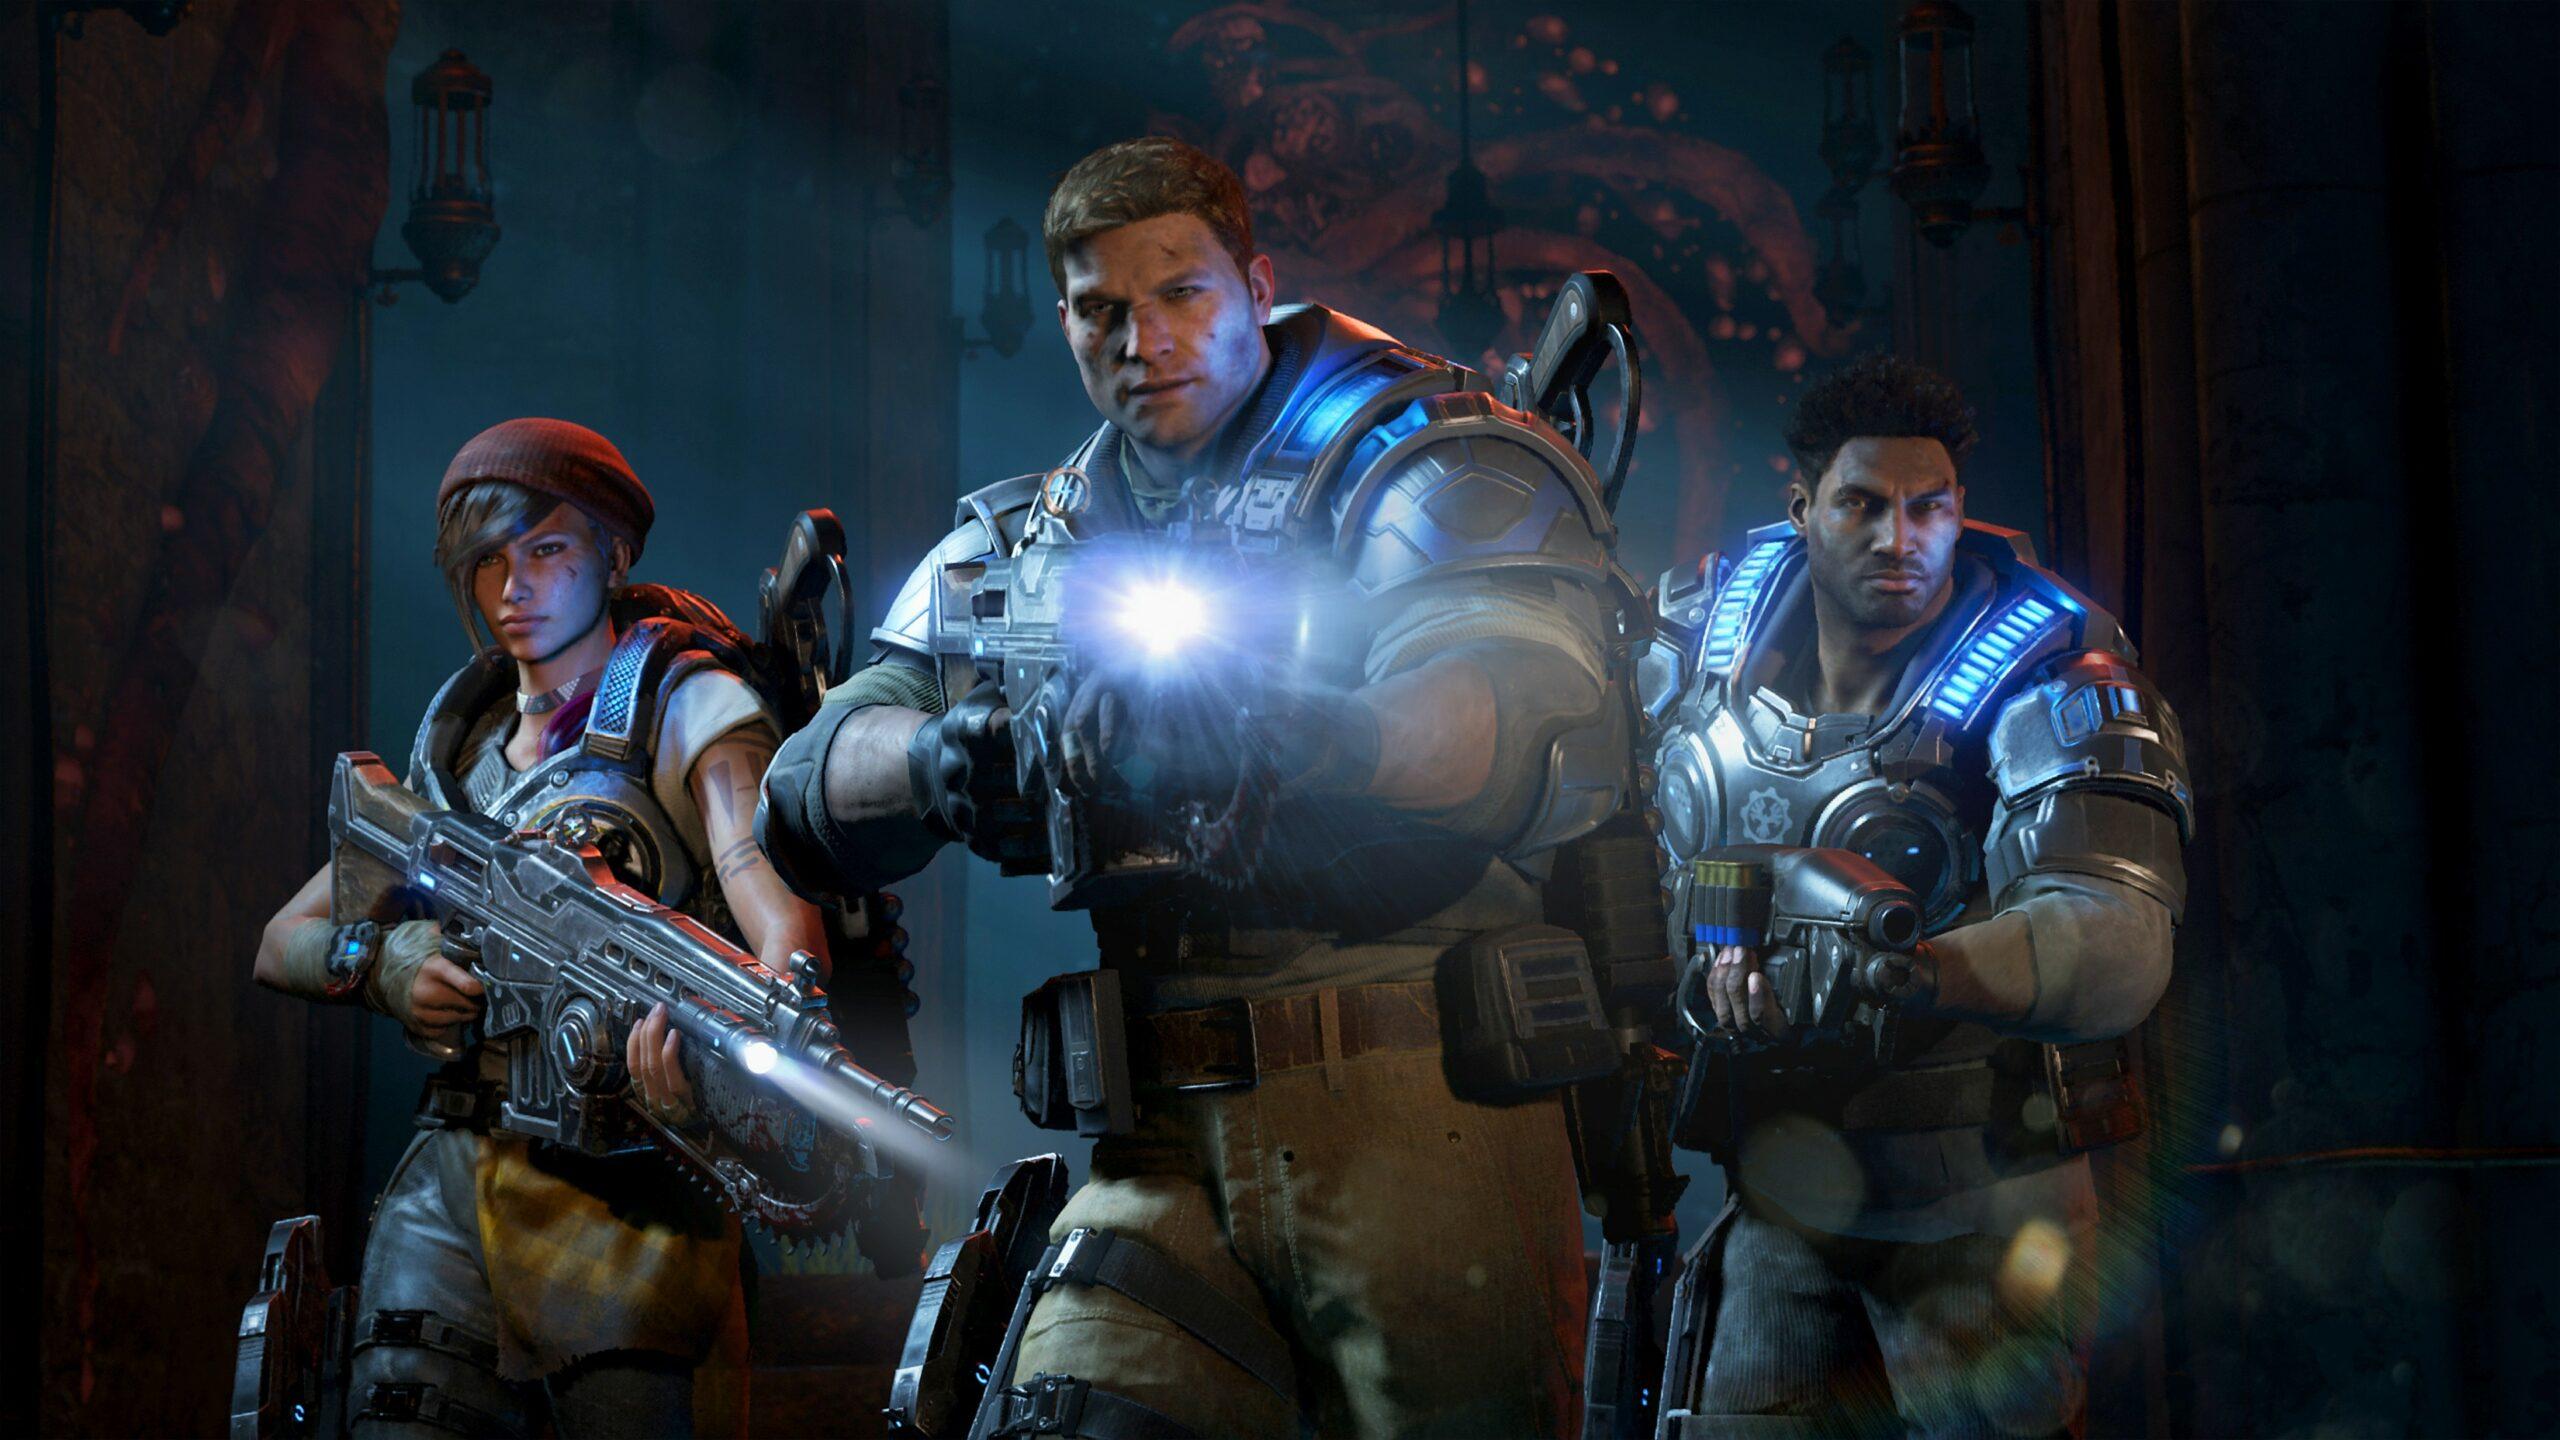 Gears-of-War-4_2016_04-25-16_006